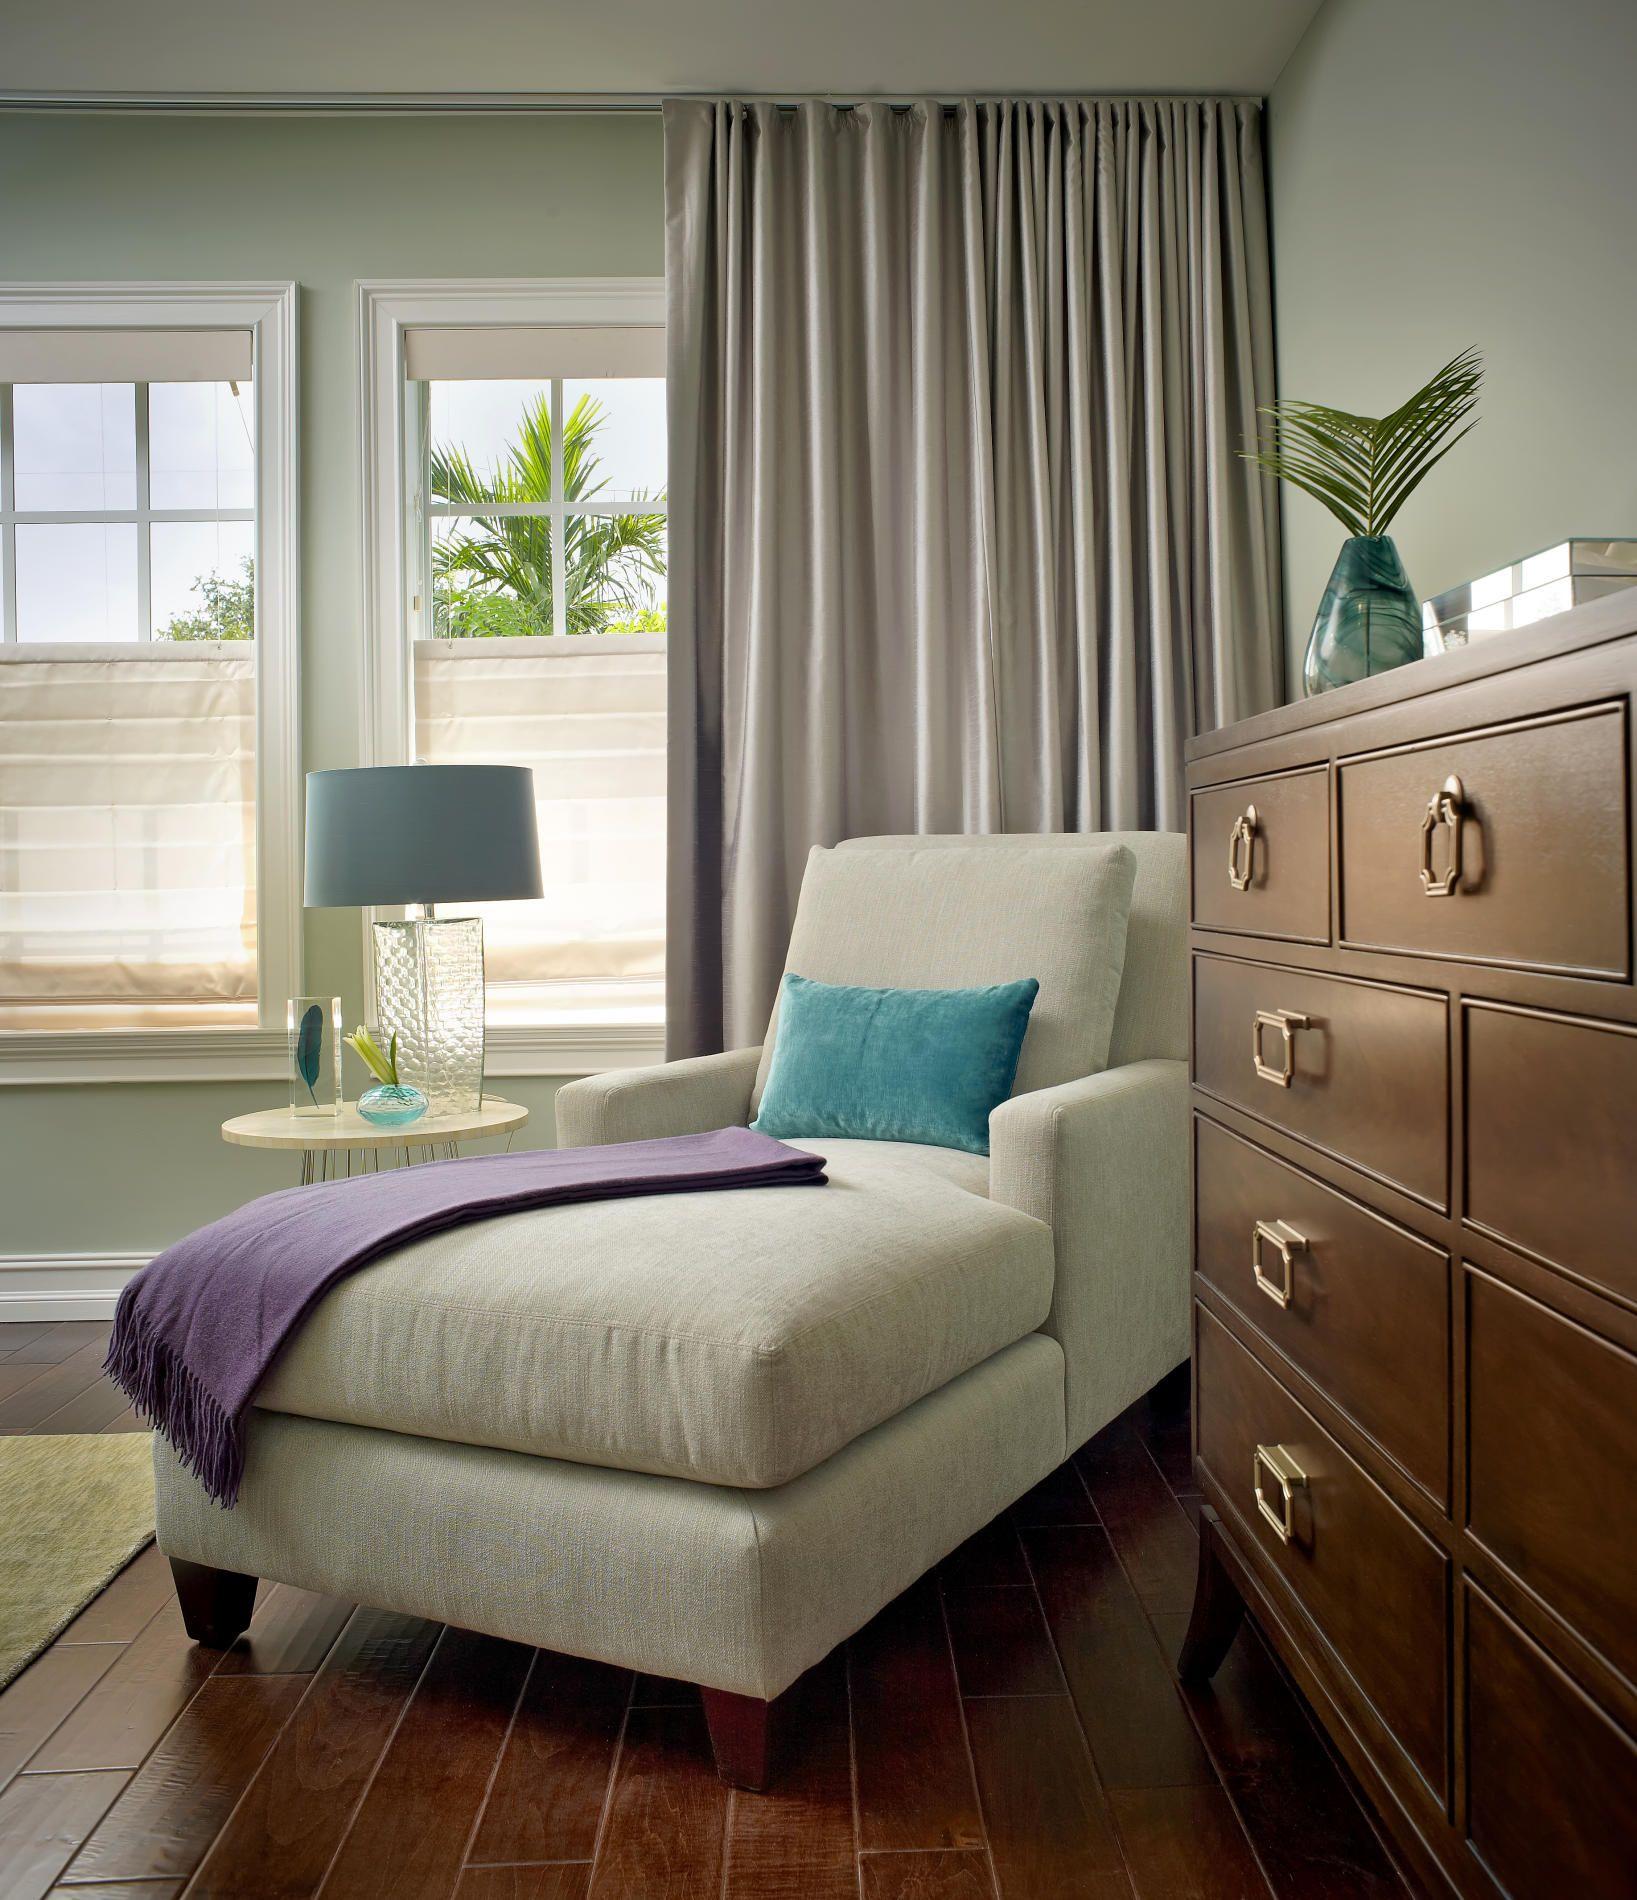 Ideas for bedroom sitting area - Master Bedroom Sitting Area Ideas Bedroom Sitting Area Design Ideas Master